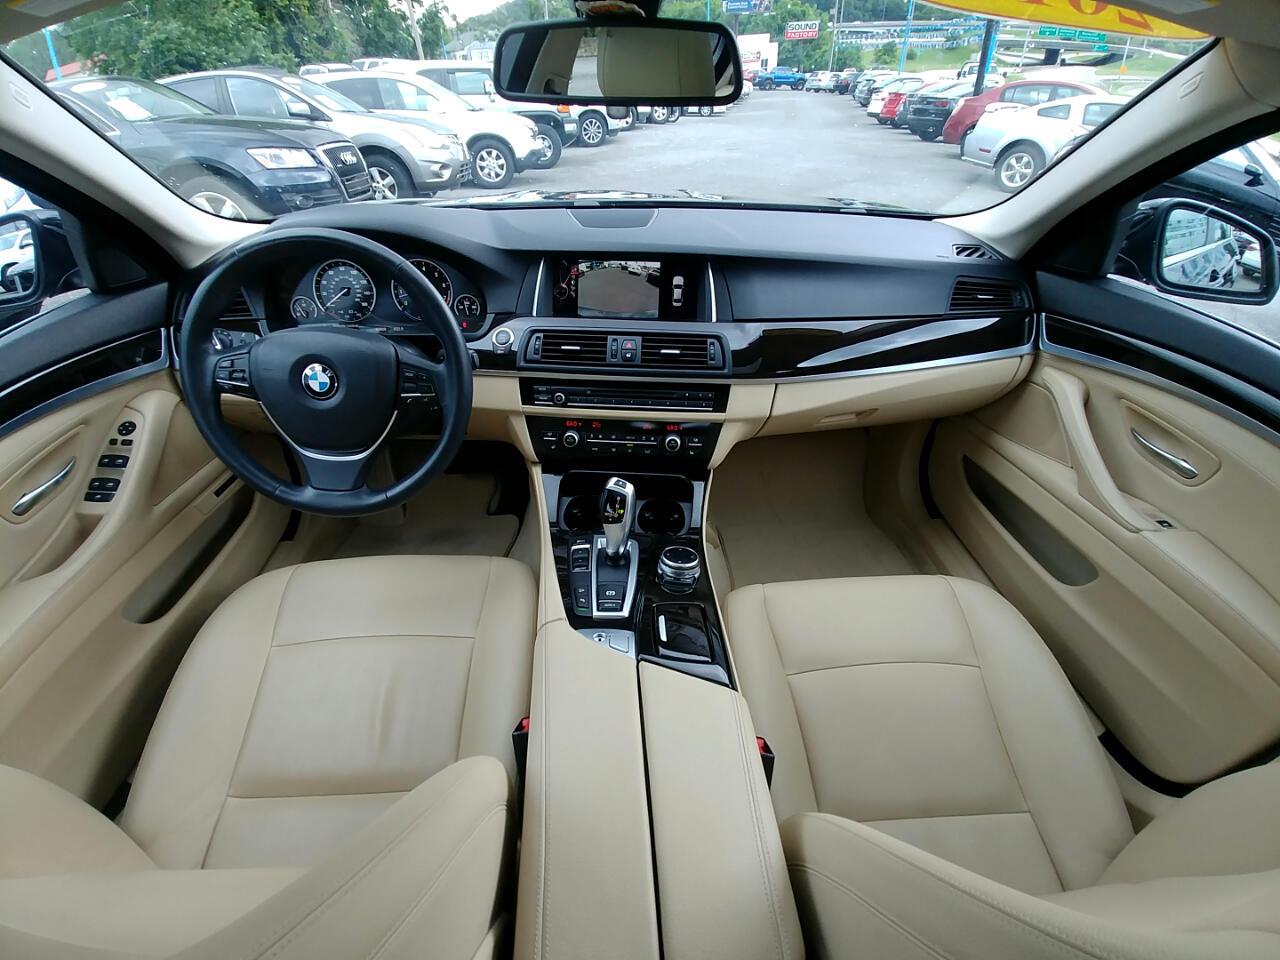 BMW 5 Series 4dr Sdn 535i xDrive AWD 2015